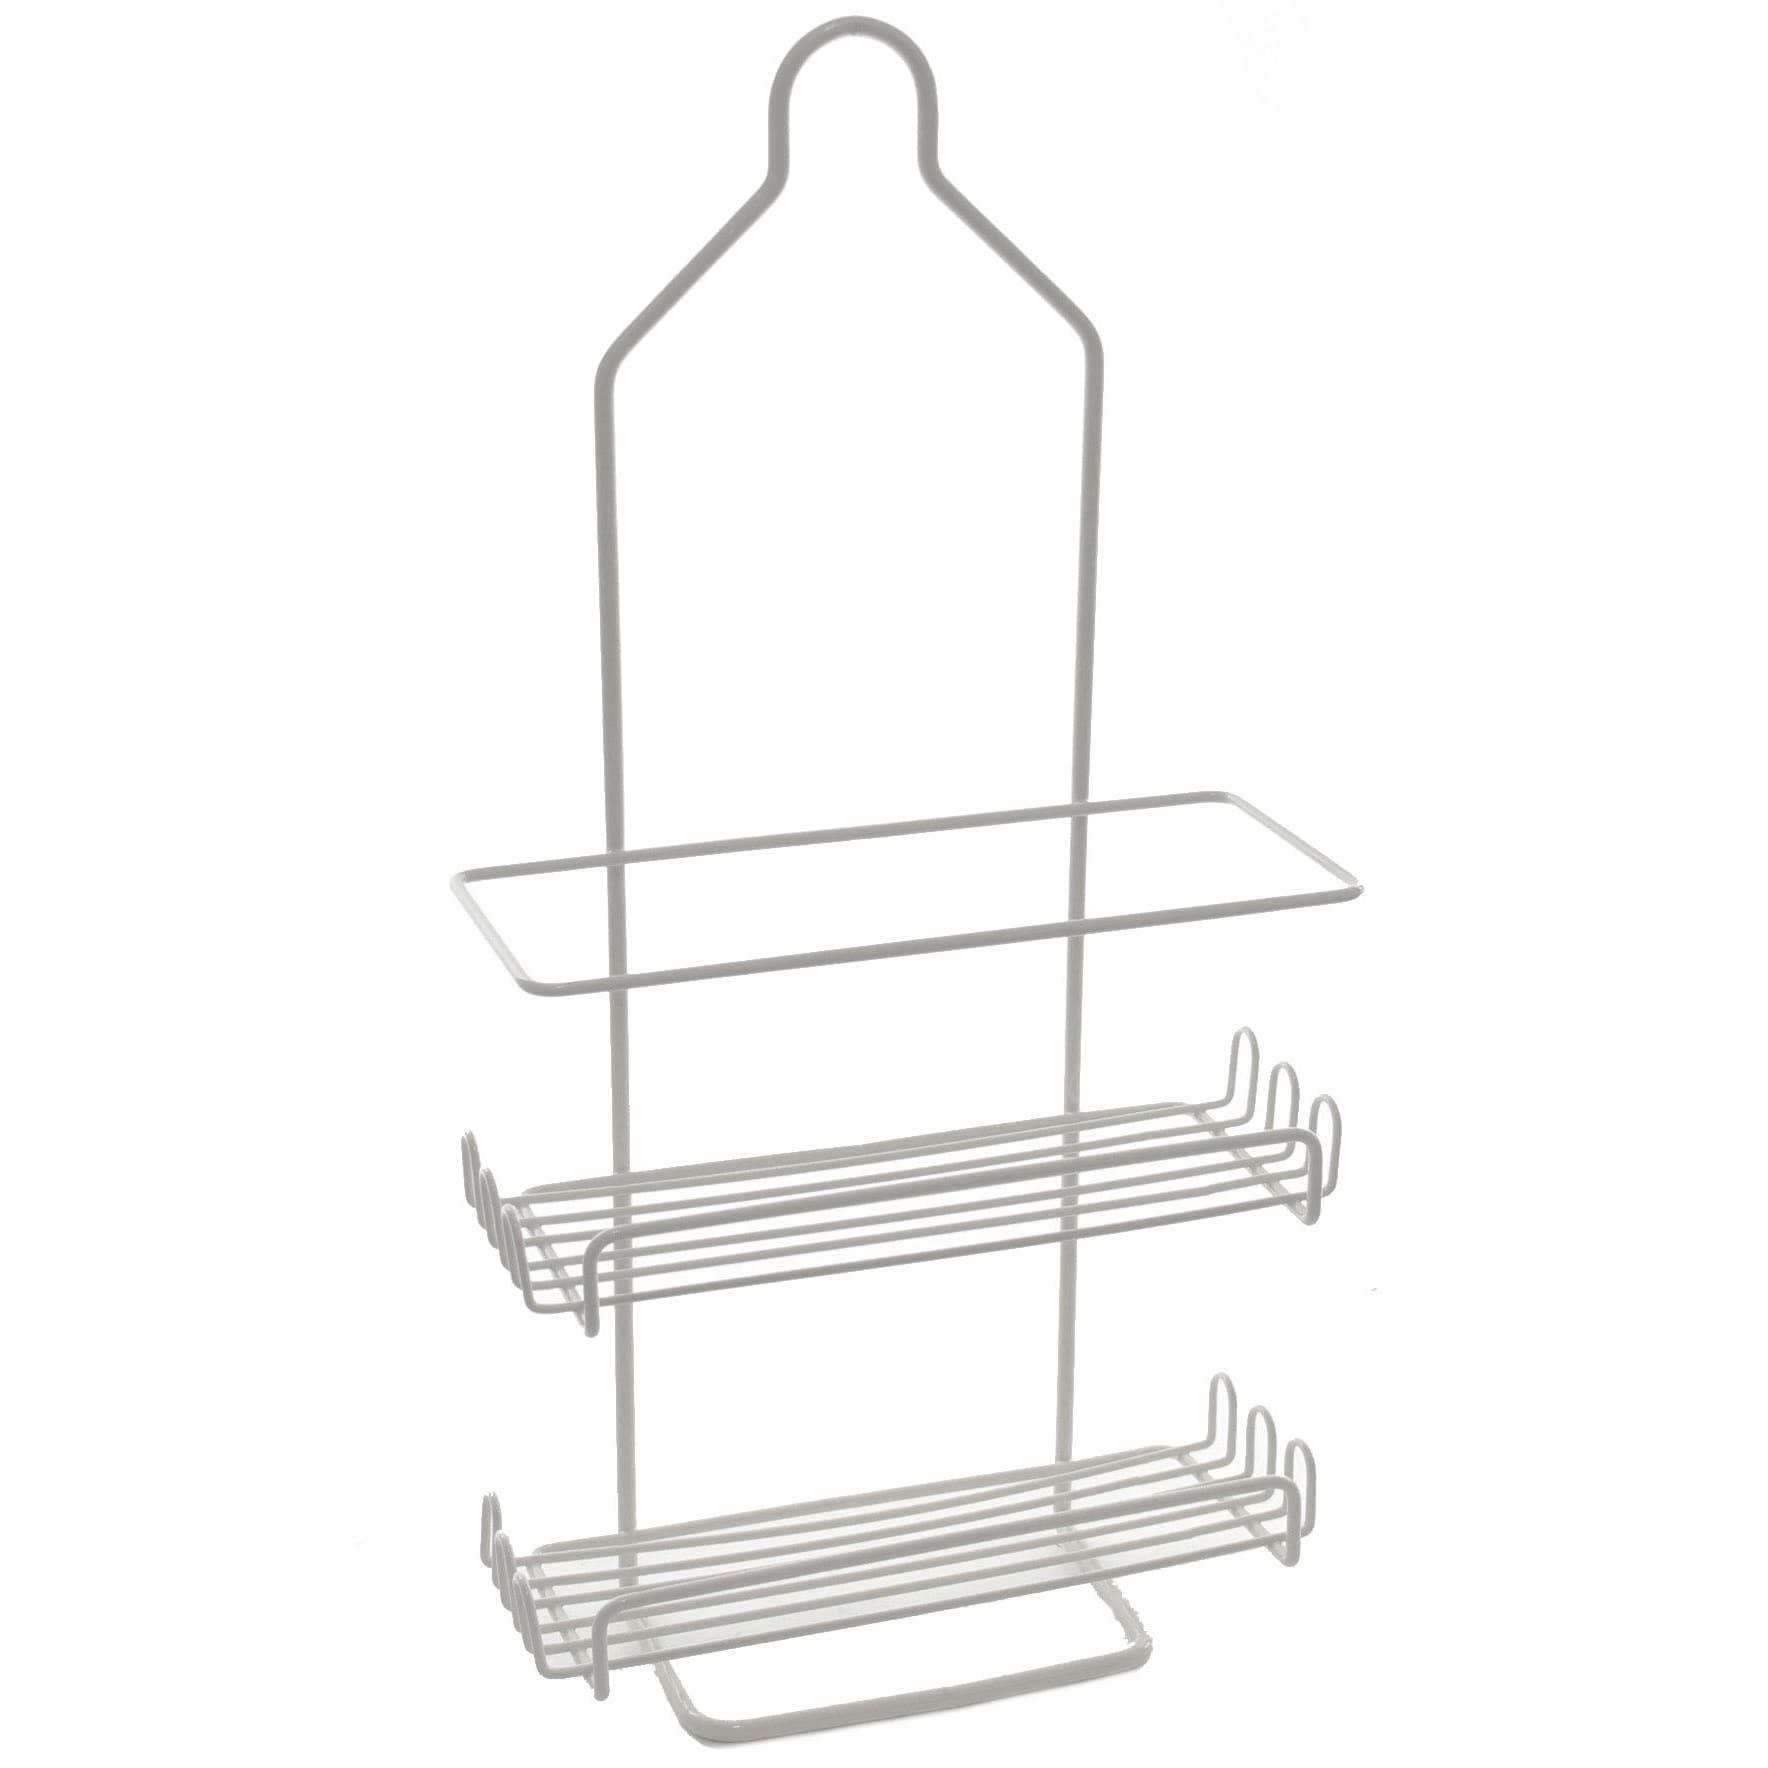 YBM Home Two Tier Deluxe Shower Caddy Rack Organizer | eBay